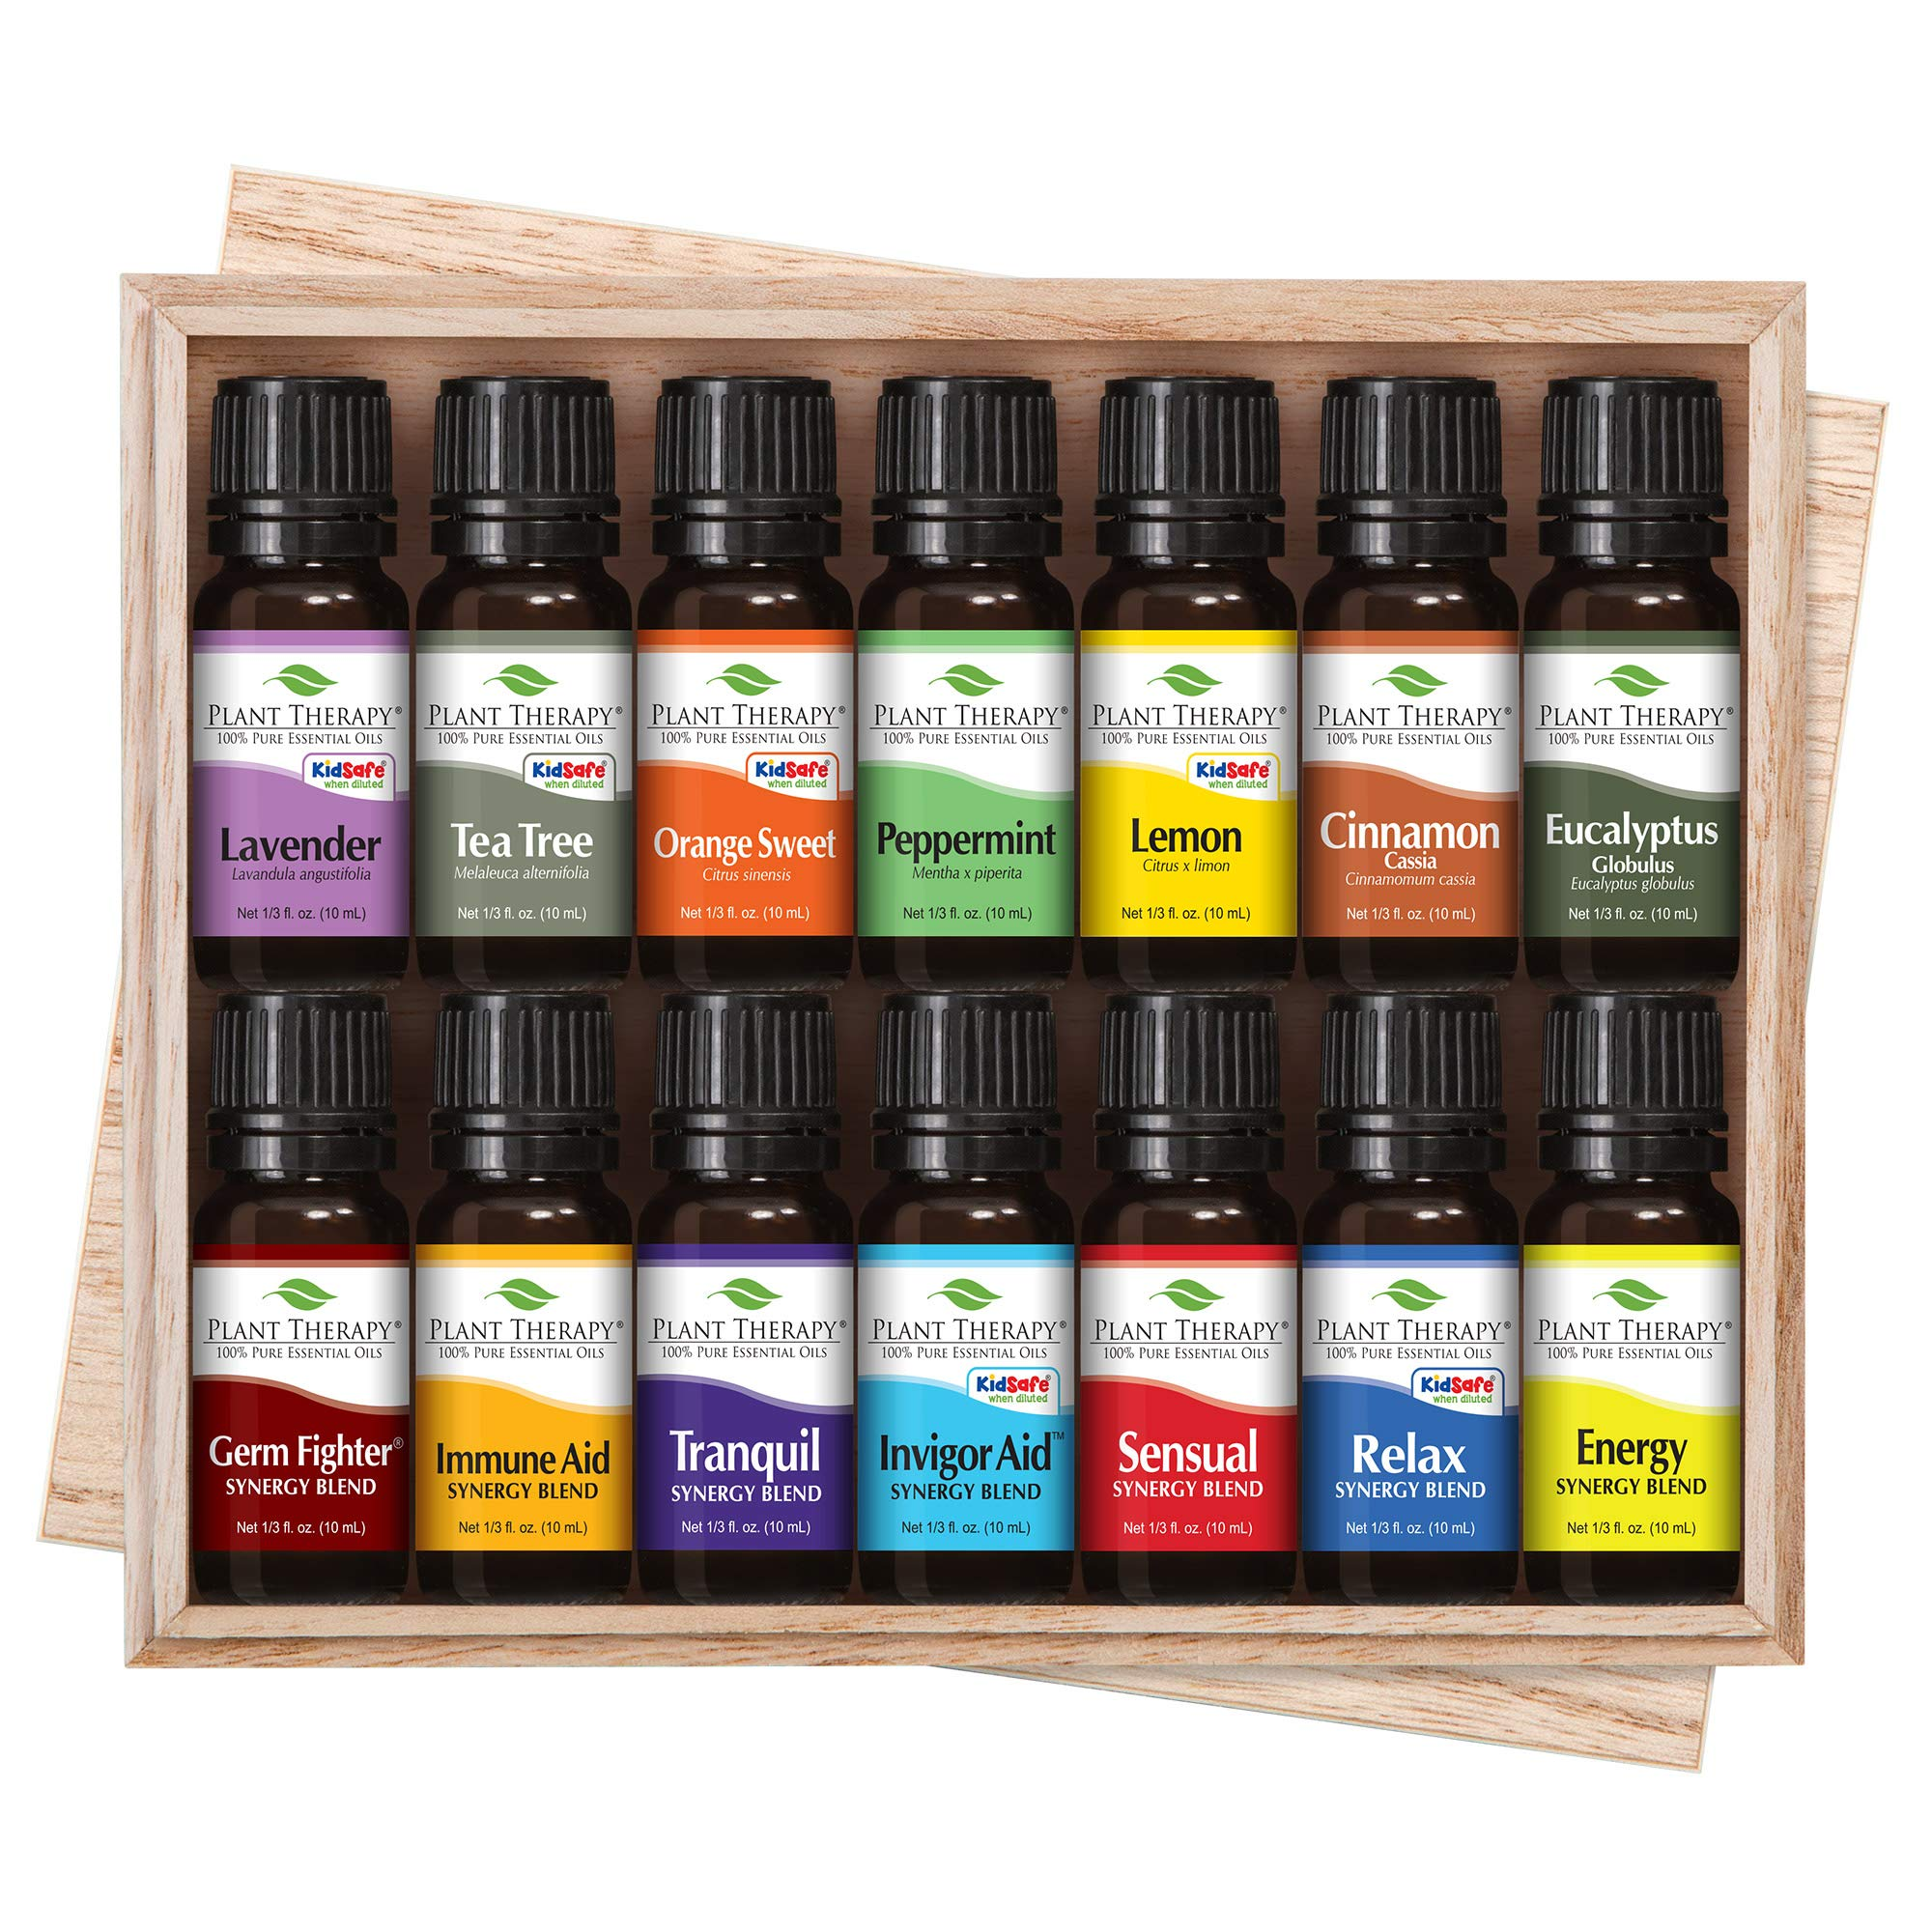 Amazon.com : Plant Therapy AromaFuse Aromatherapy